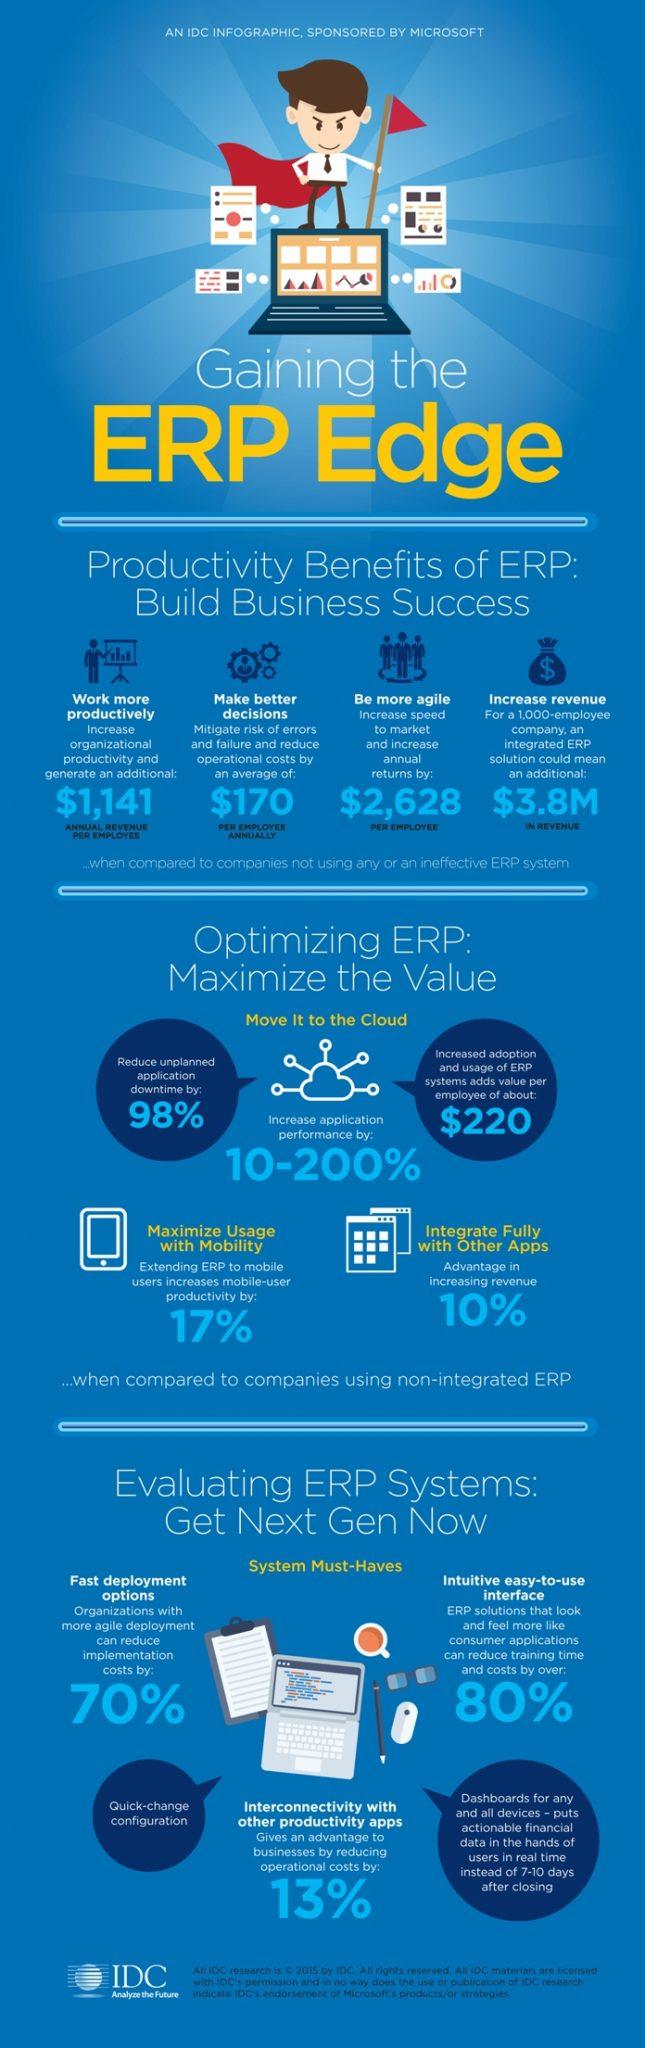 INFOGRAPHIC: Gaining the ERP Edge